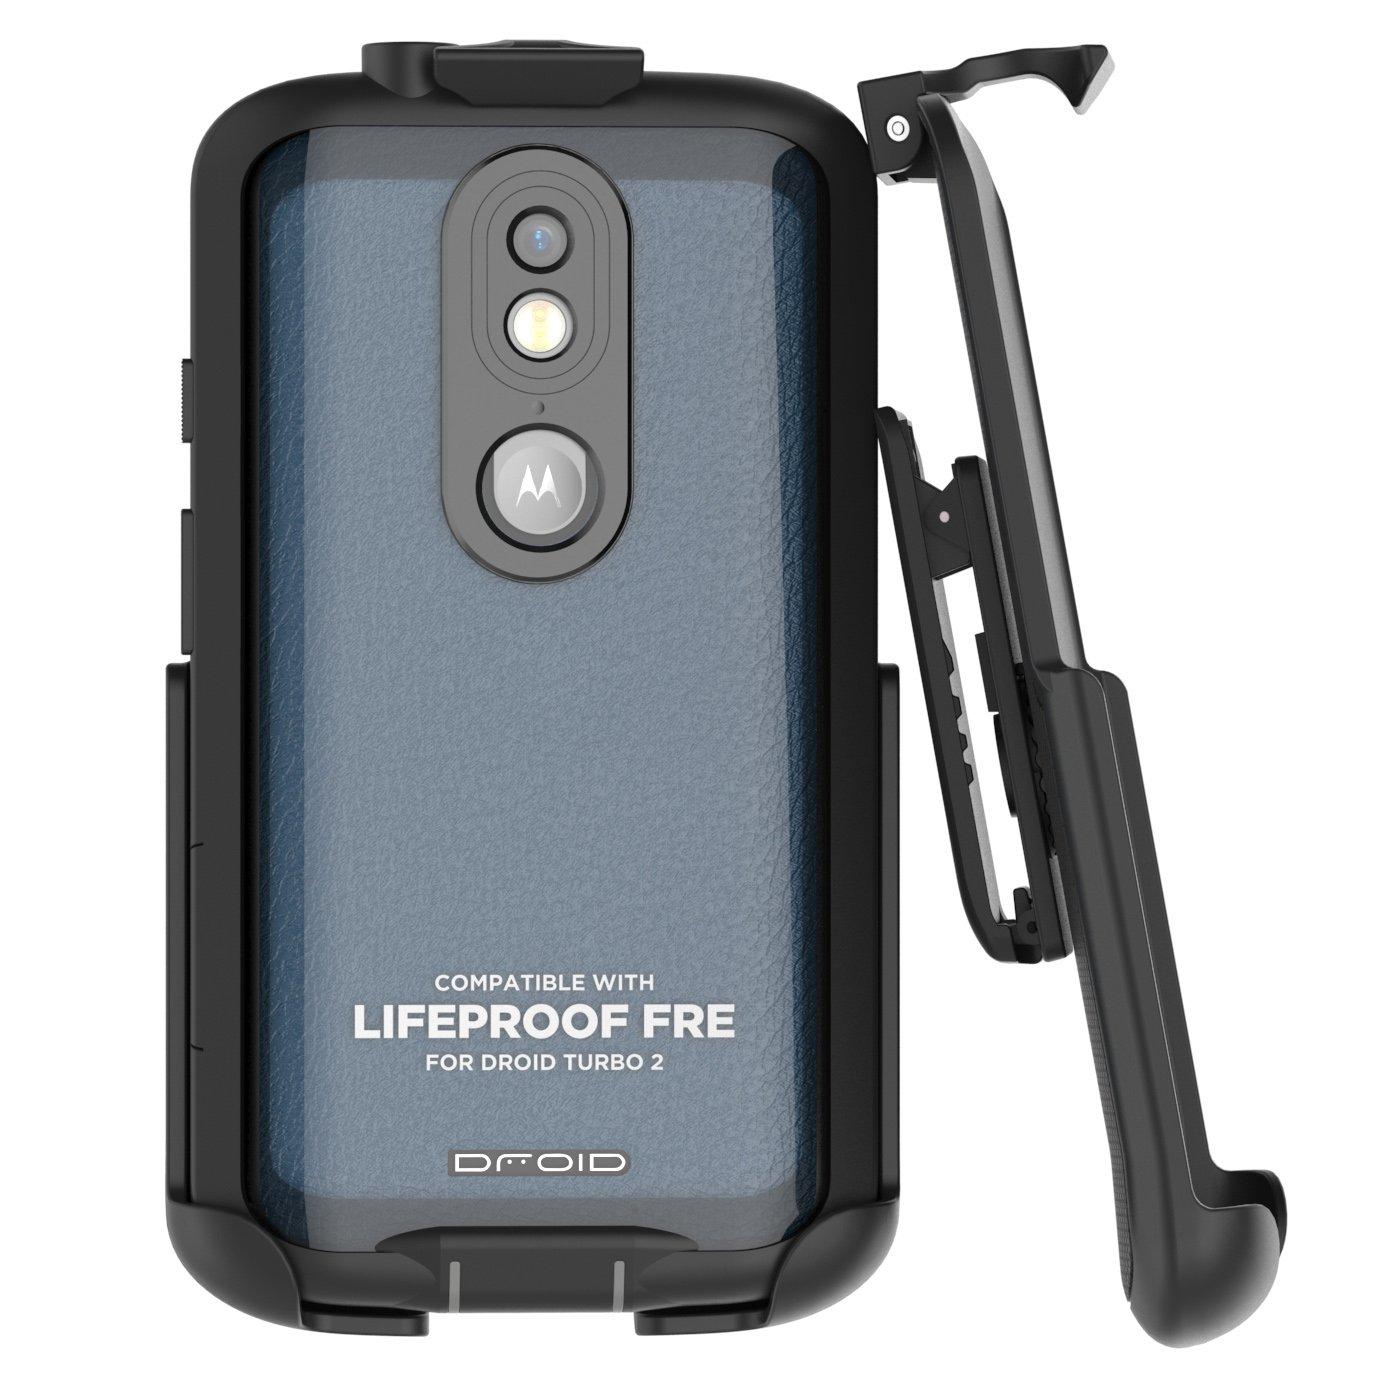 LifeProof FREケース用ベルトクリップホルスター - Droid Turbo 2(ケースは含まれていません)(ケース入り   B01L7V2Q70